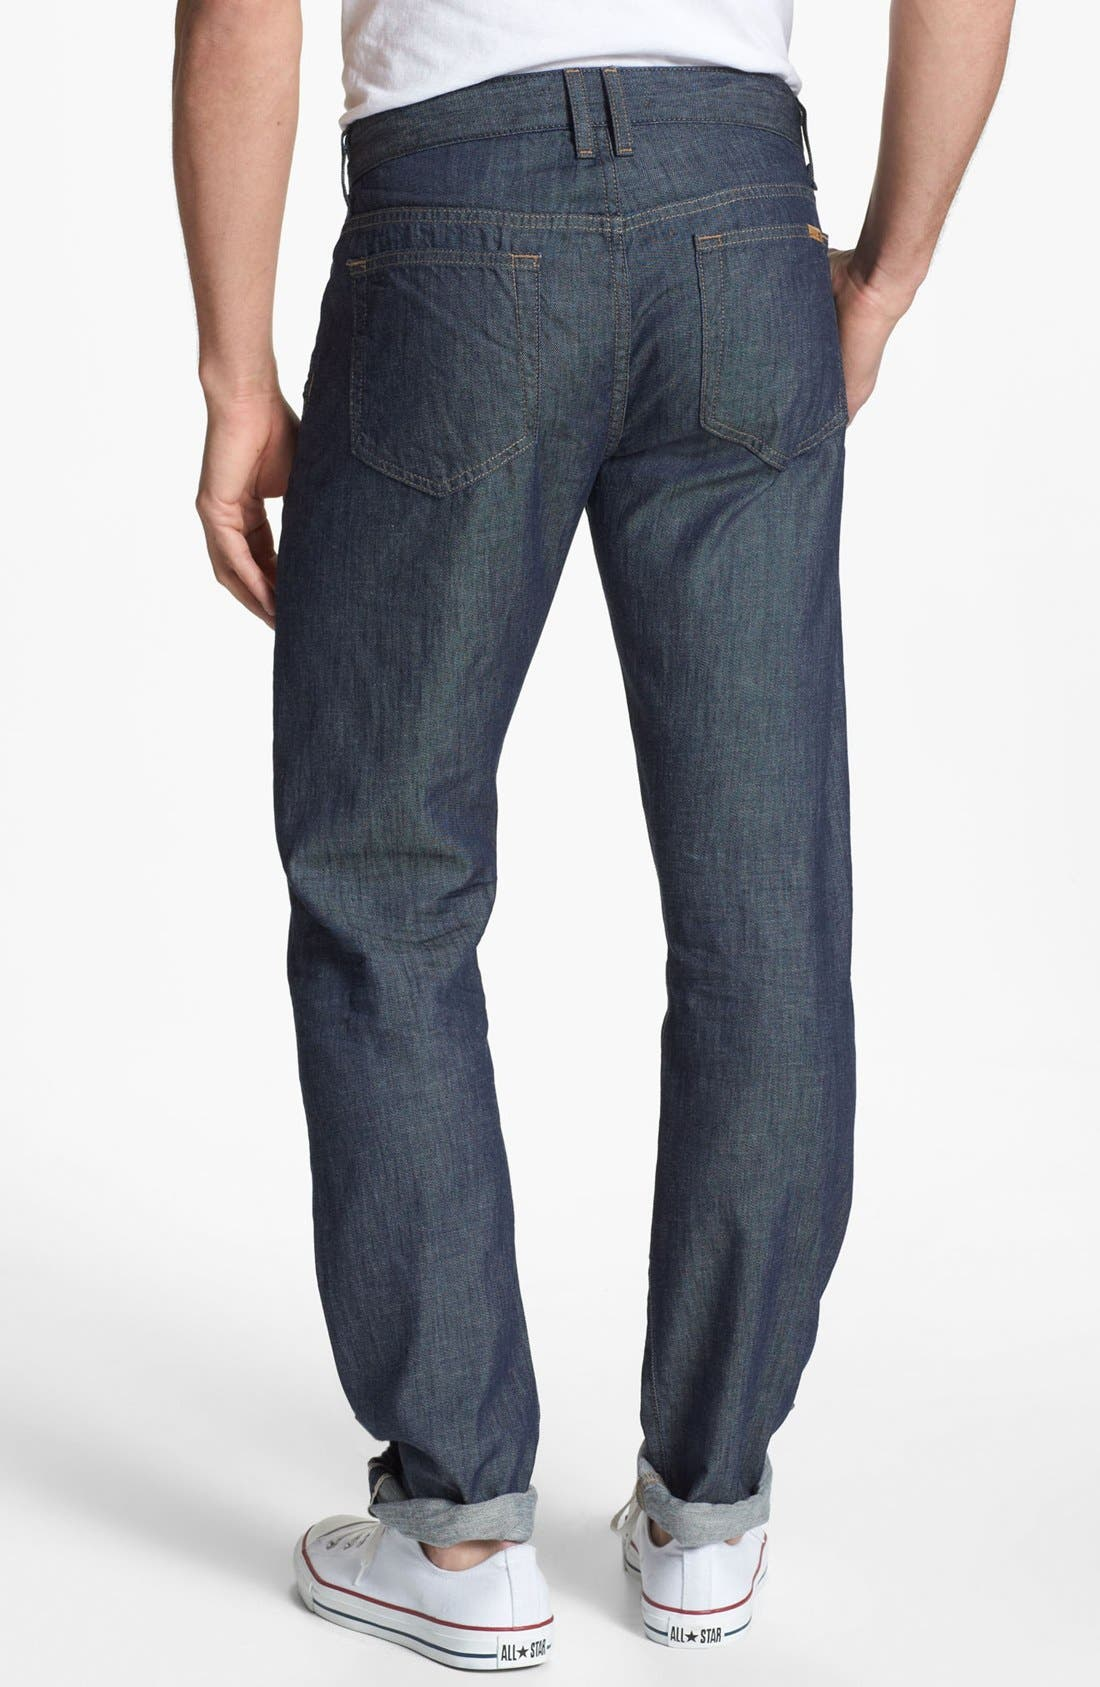 Alternate Image 1 Selected - Joe's 'Brixton' Slim Fit Selvedge Jeans (Laures)